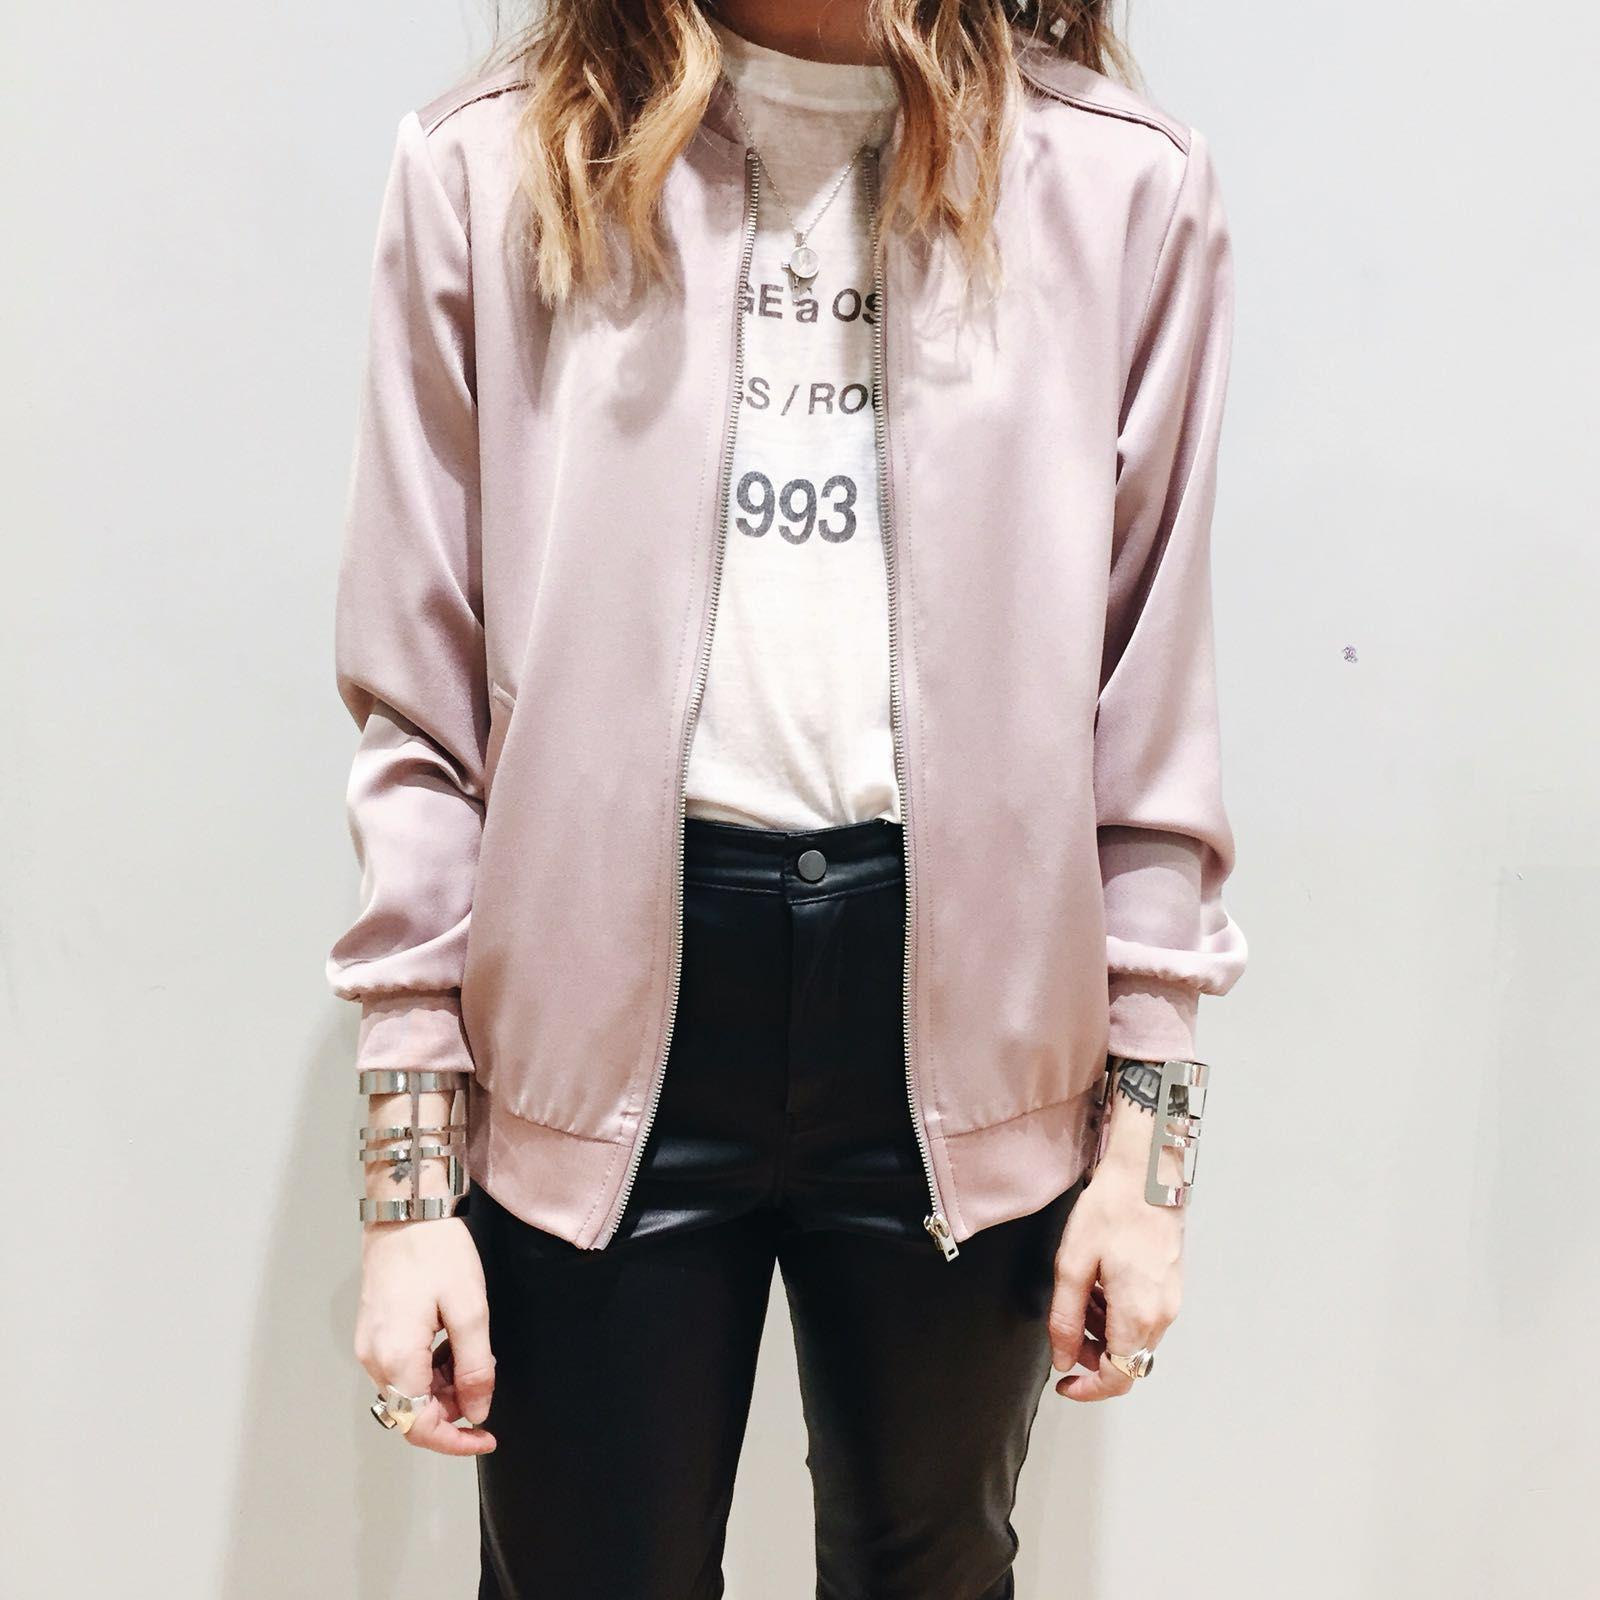 Satin Bomber Jacket Fashion Clothes Jackets [ 1600 x 1600 Pixel ]